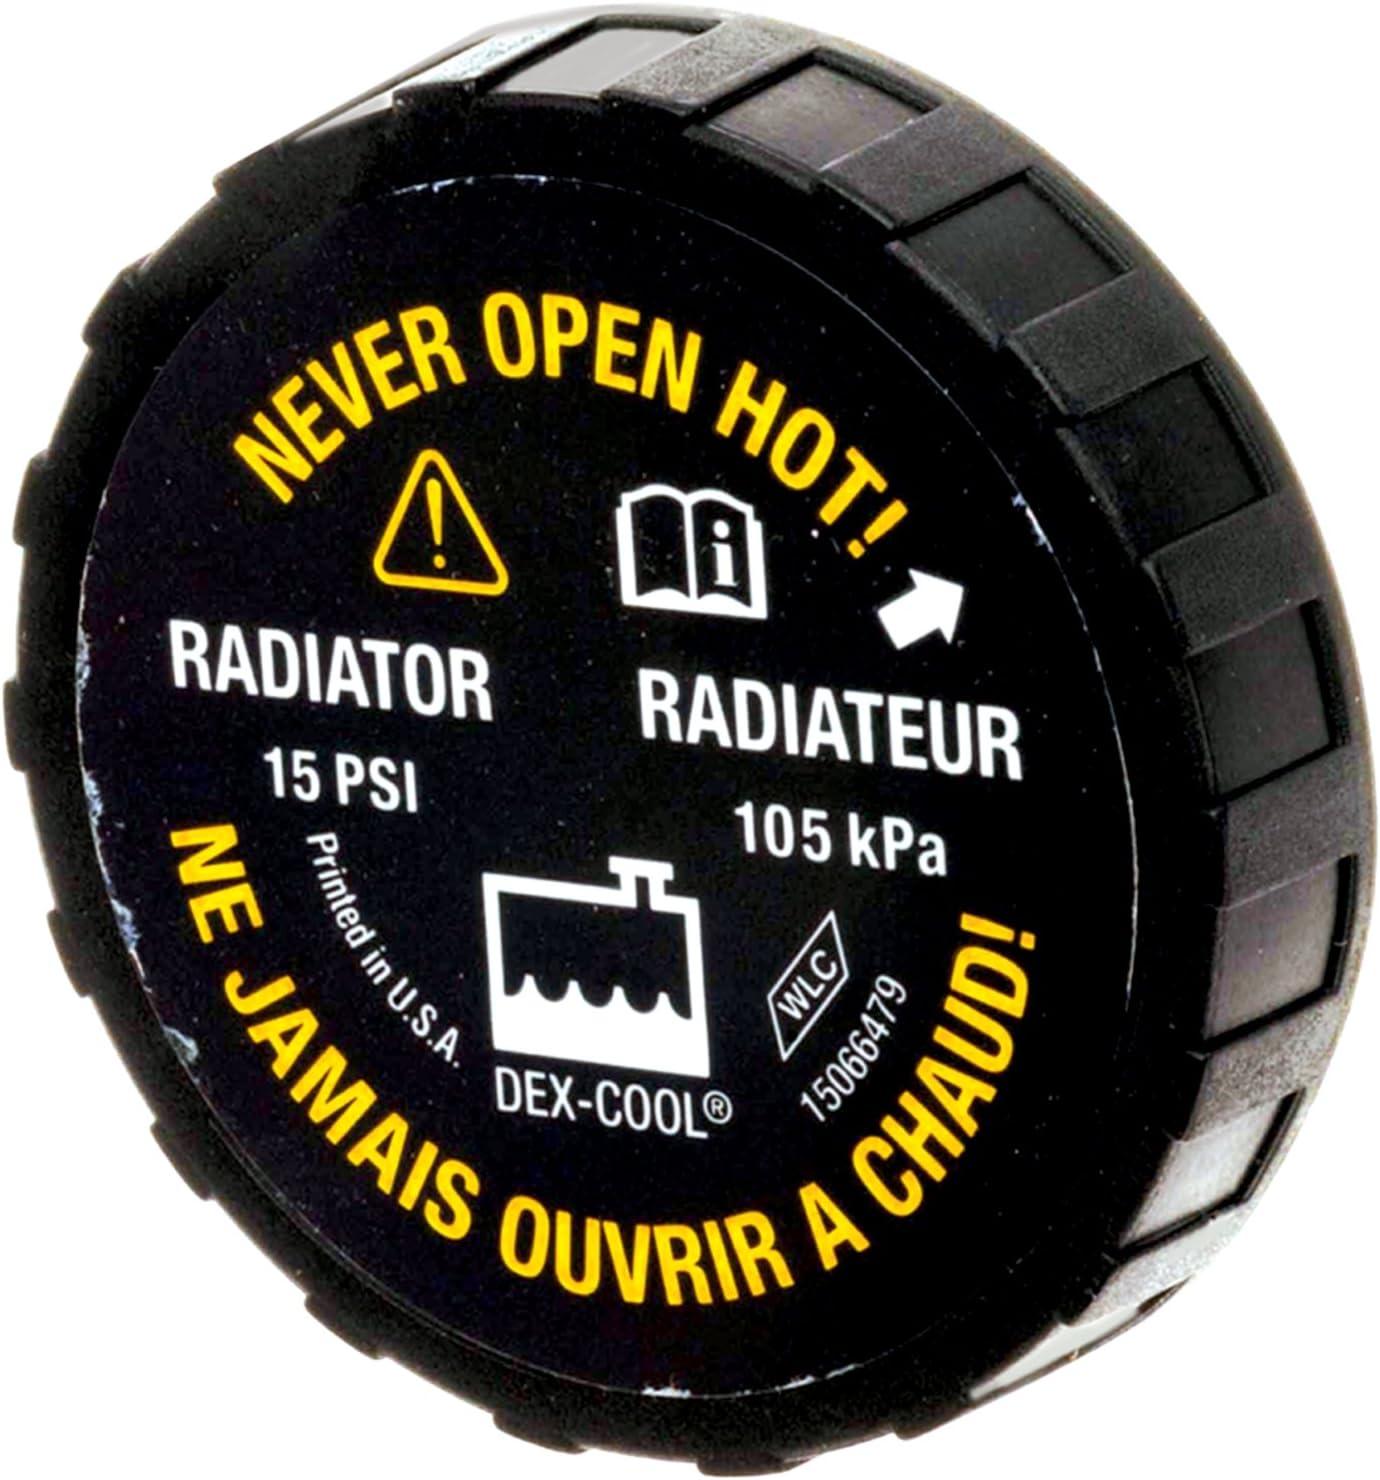 Radiator Cap ACDelco RC97 GM Original Equipment 15 P.S.I